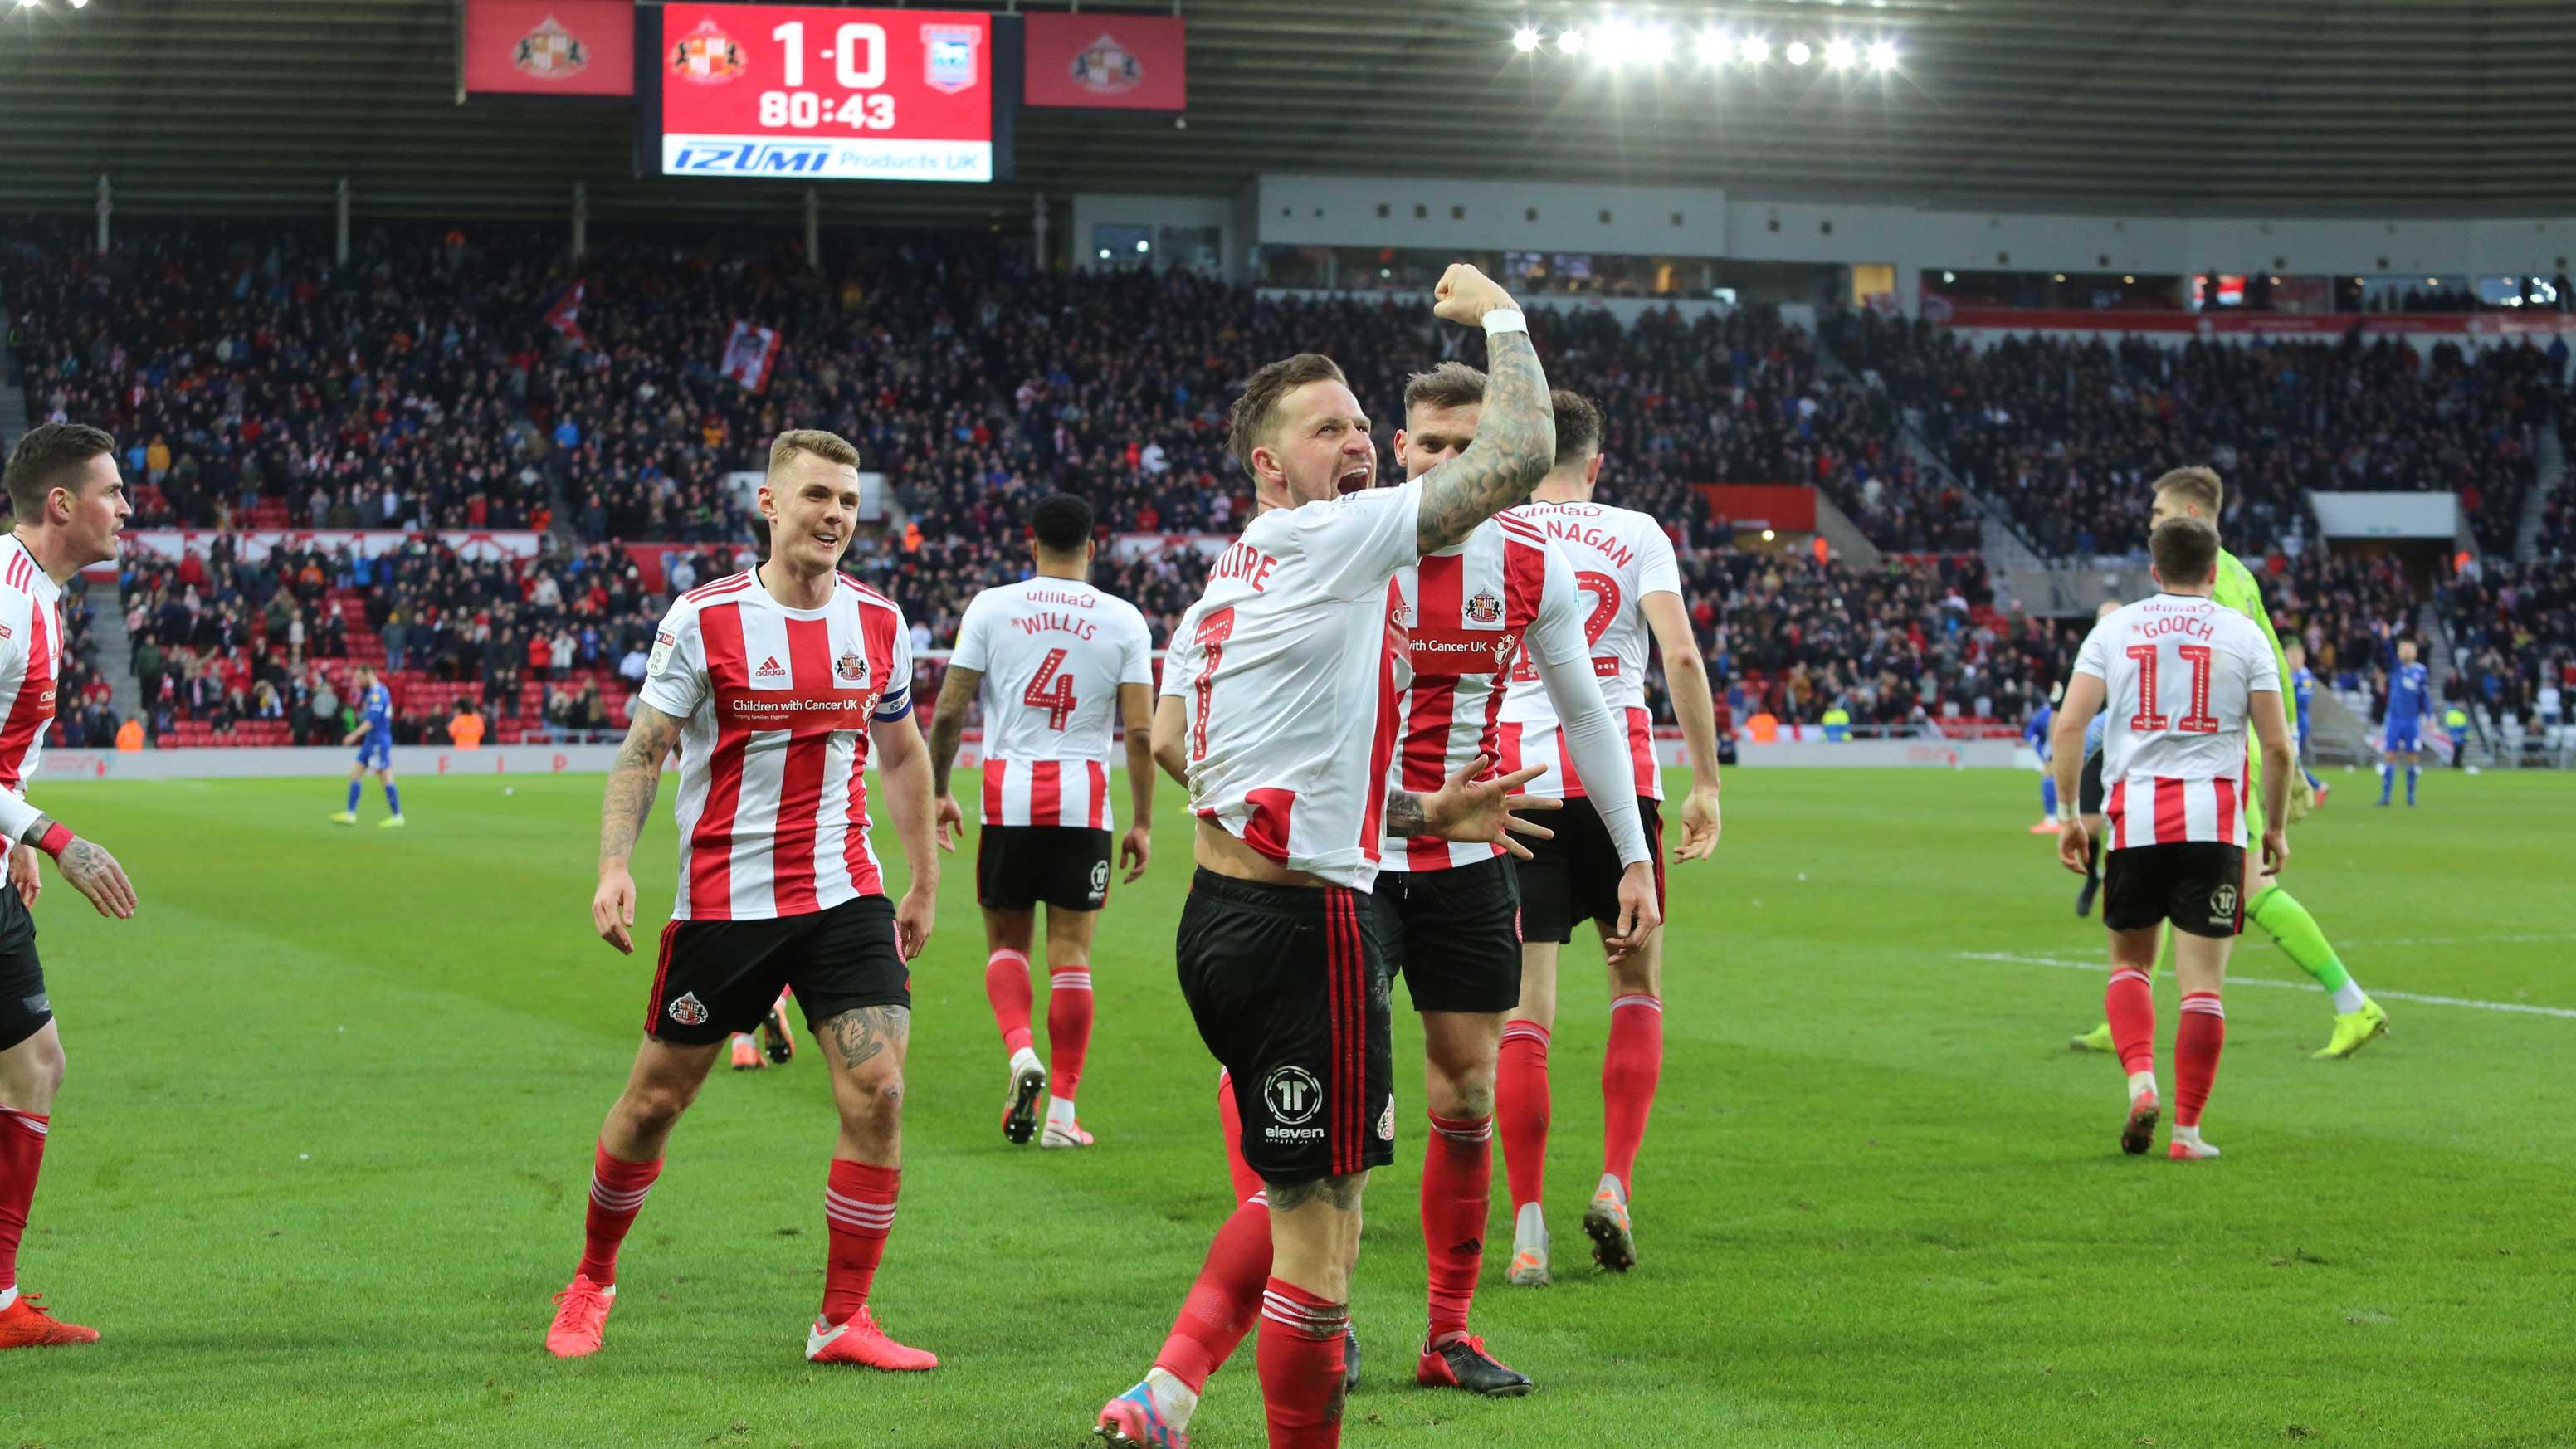 Maguire celebration Ipswich SAFC blog